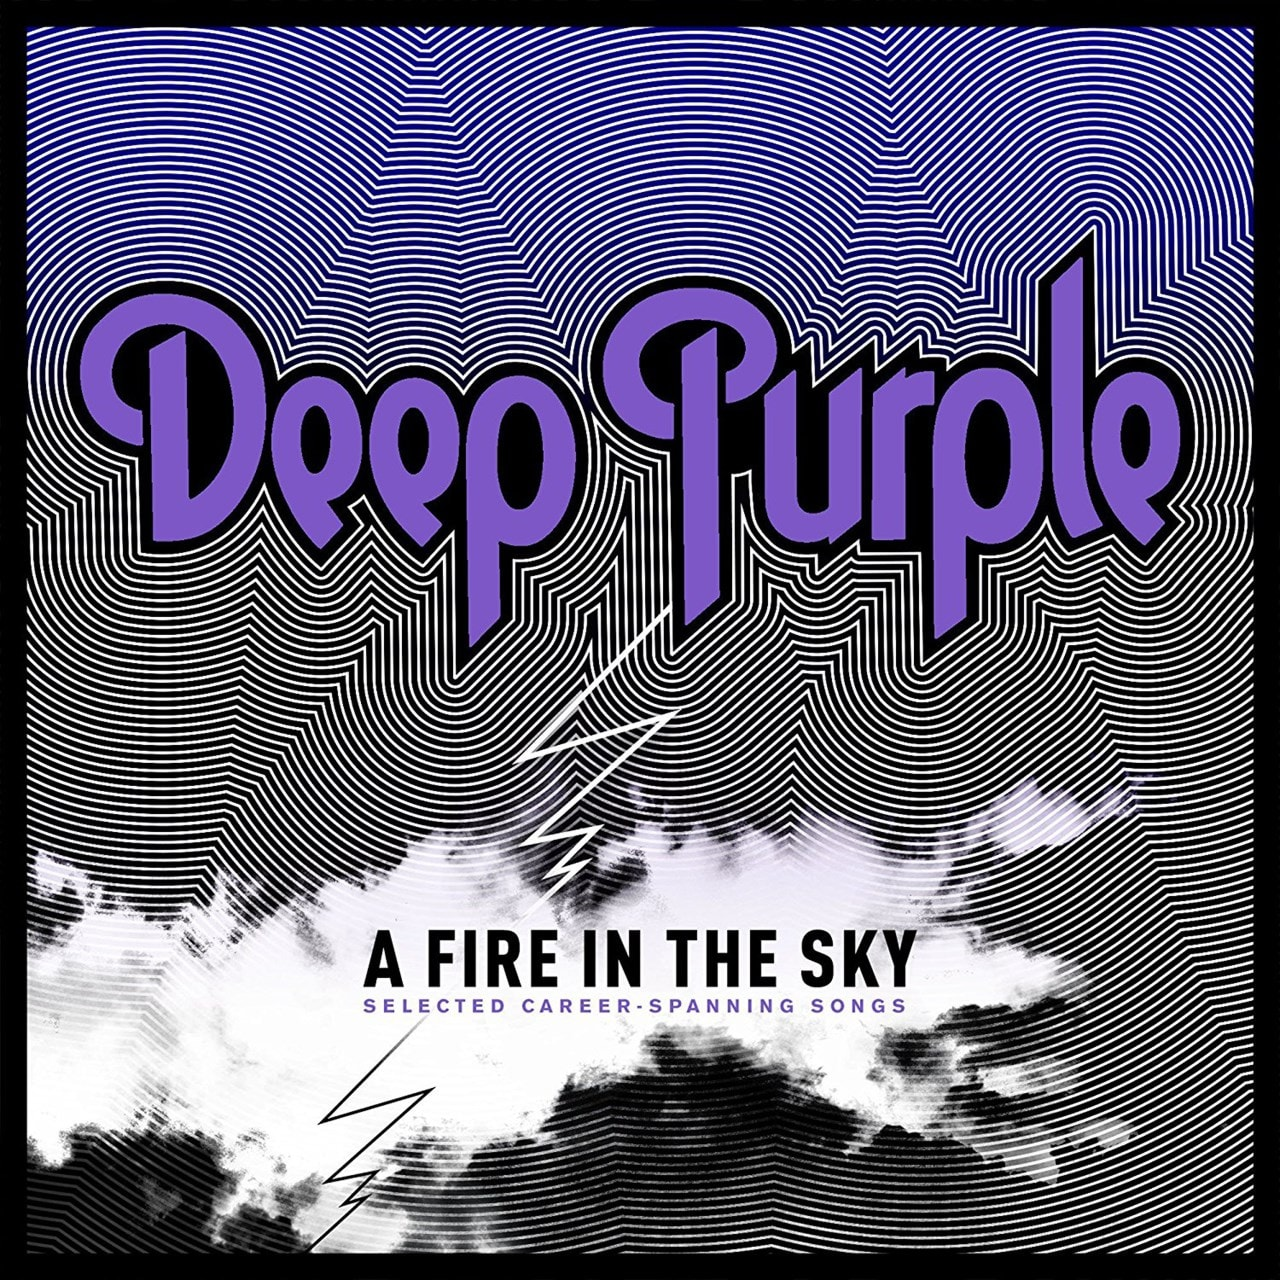 A Fire in the Sky - 1